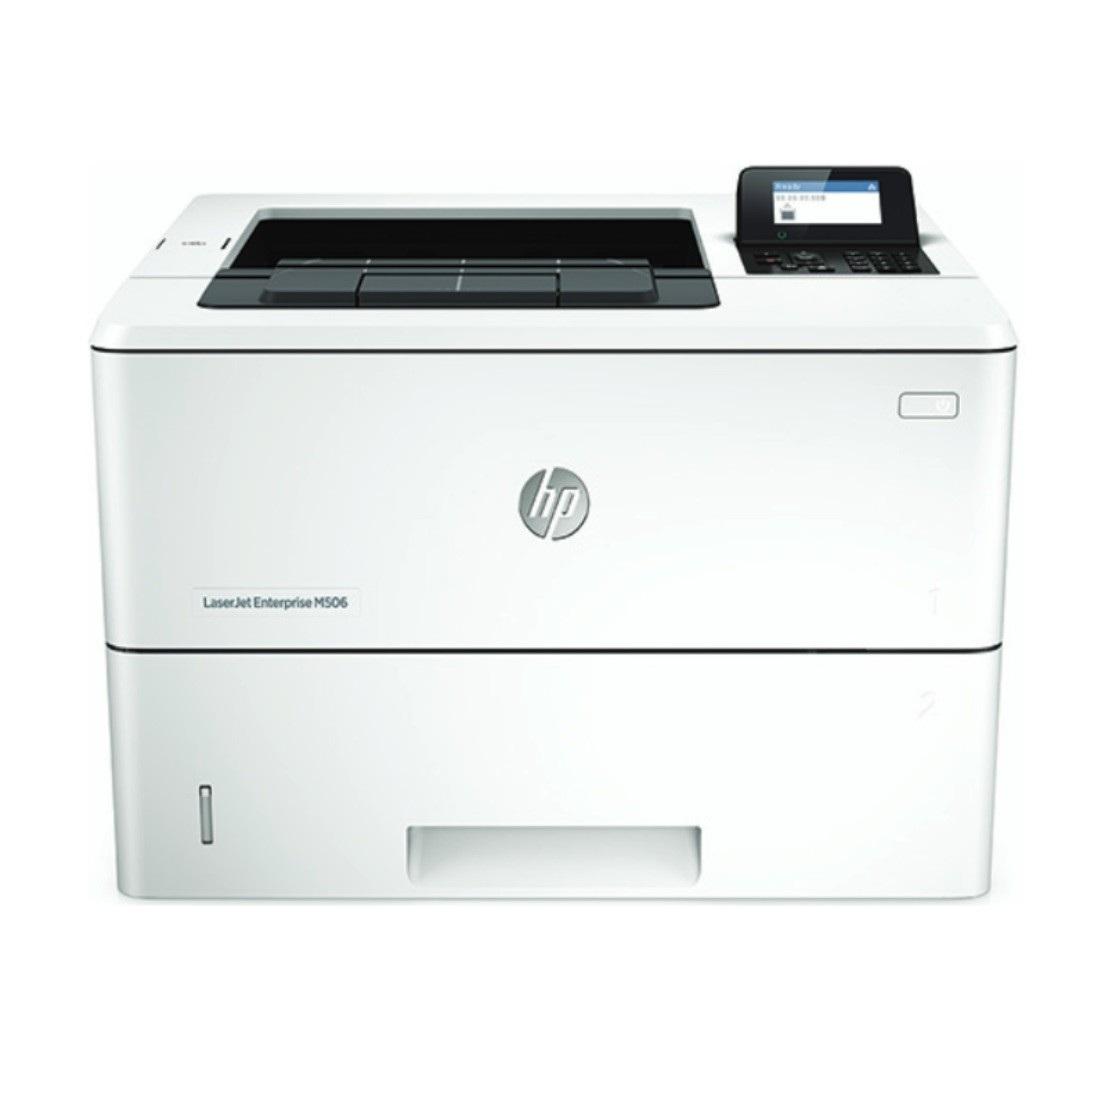 Máy in laser đen trắng HP M402DN-C5F94A